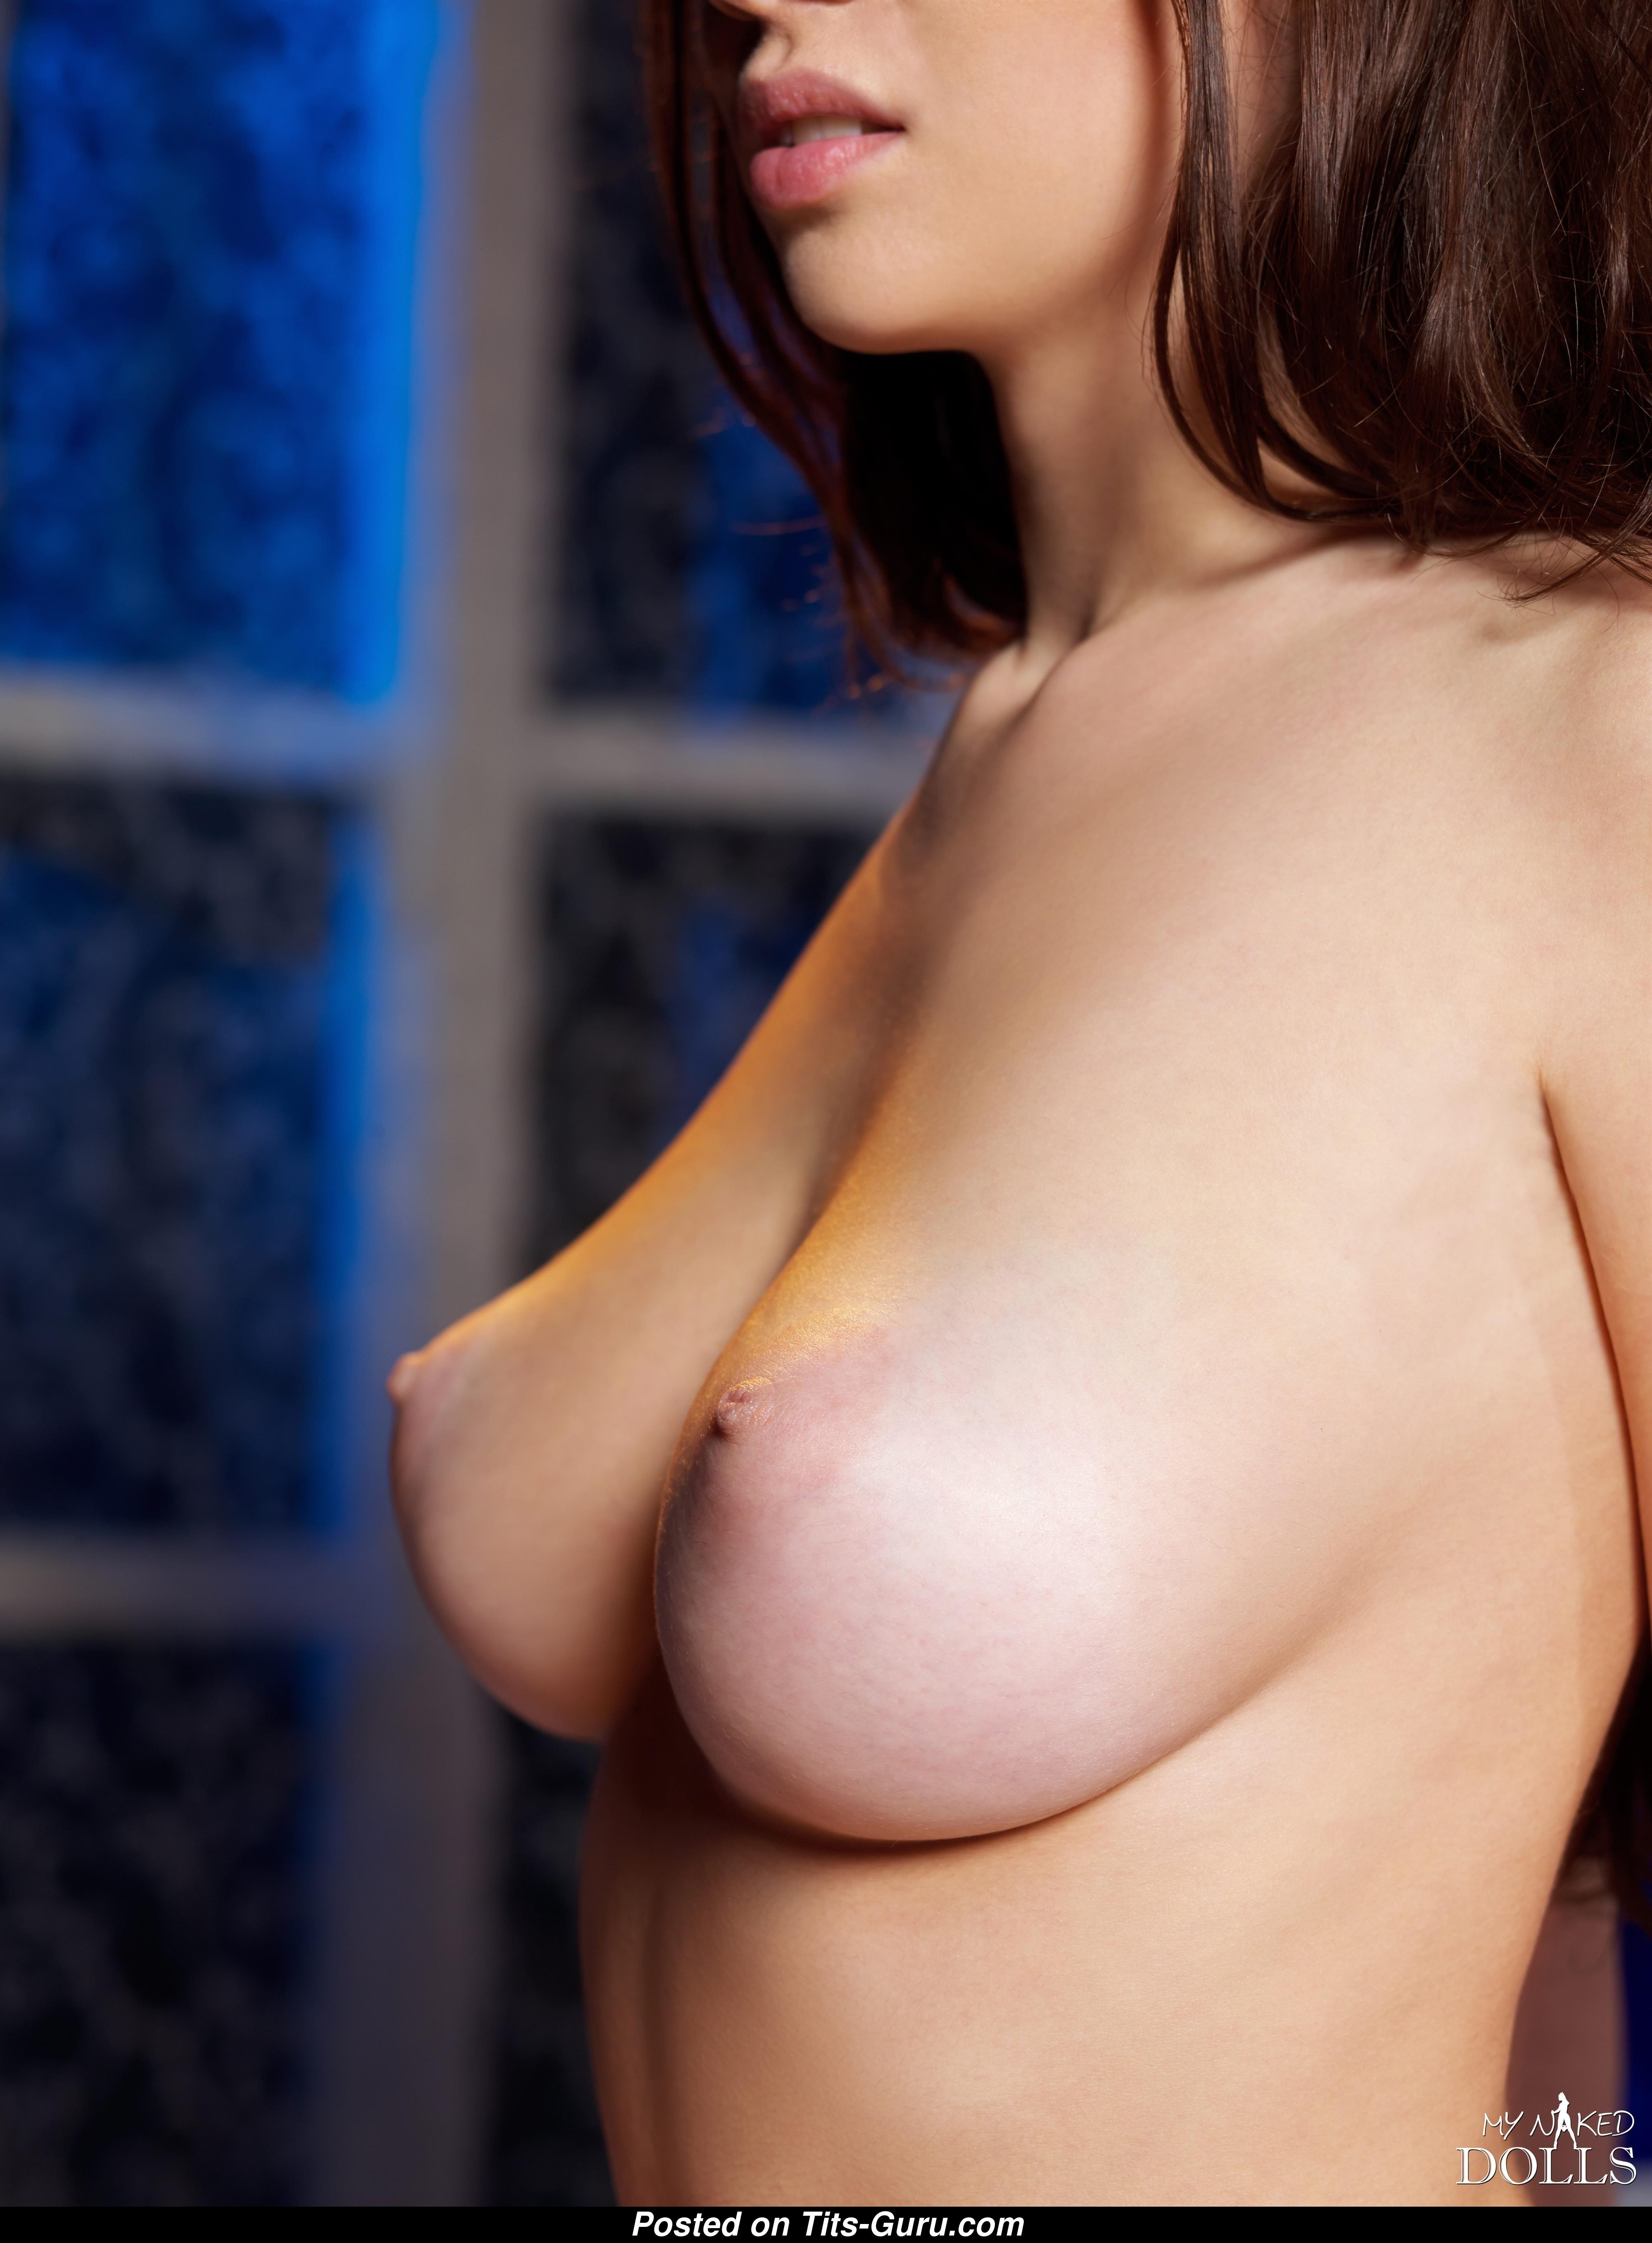 Tits and nipple